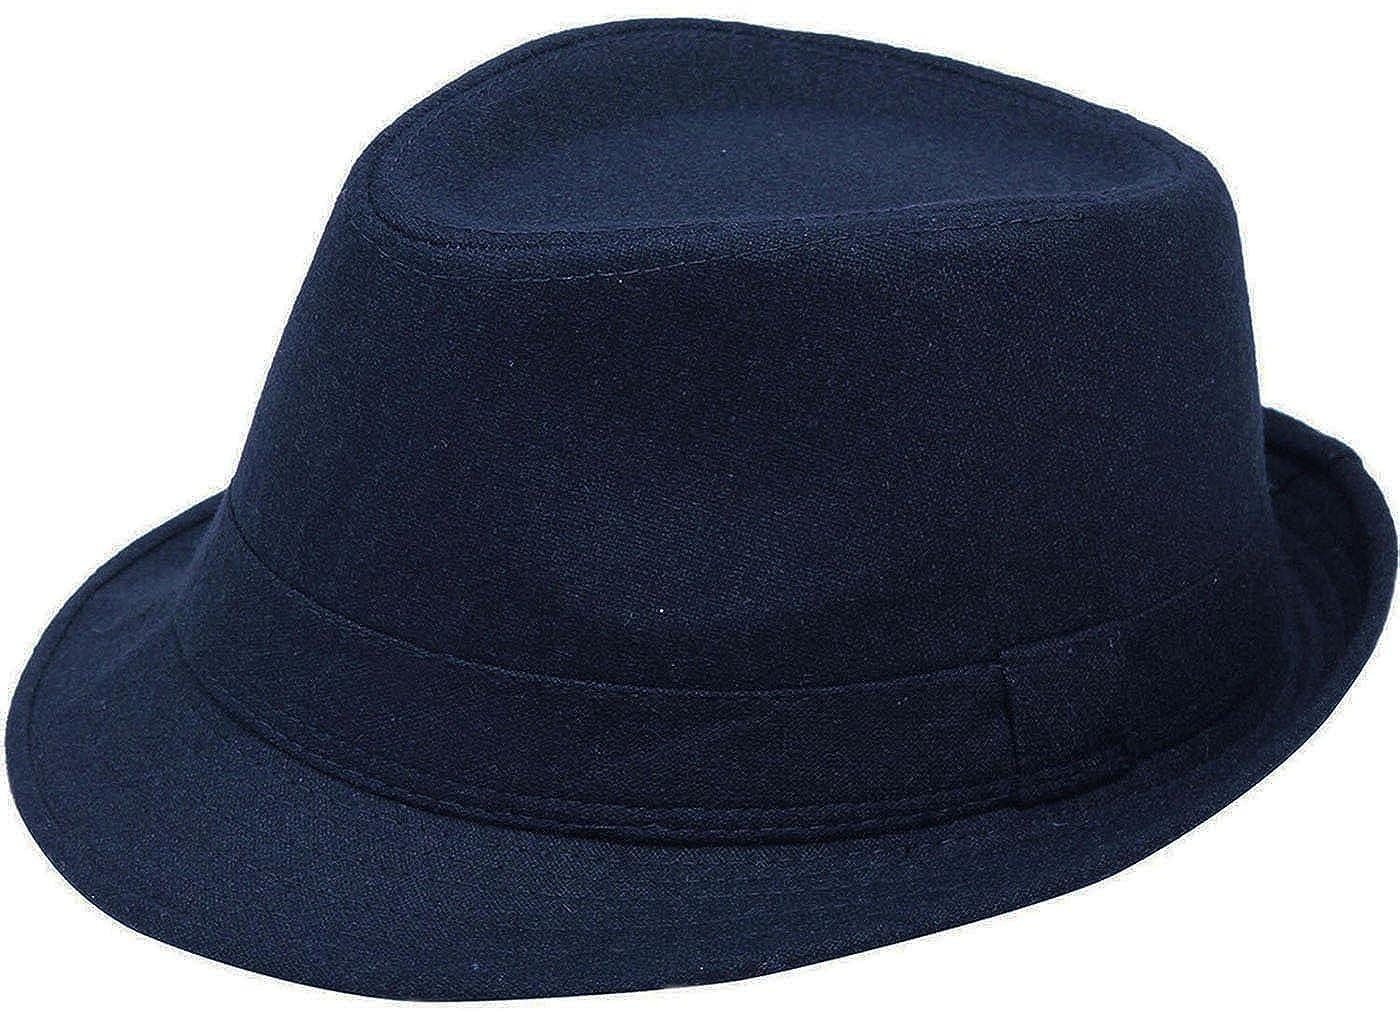 Men & Women's Classic Wool Blend Structured Fedora Hat Black One Size (59cm) fedora gangster men fedora for men